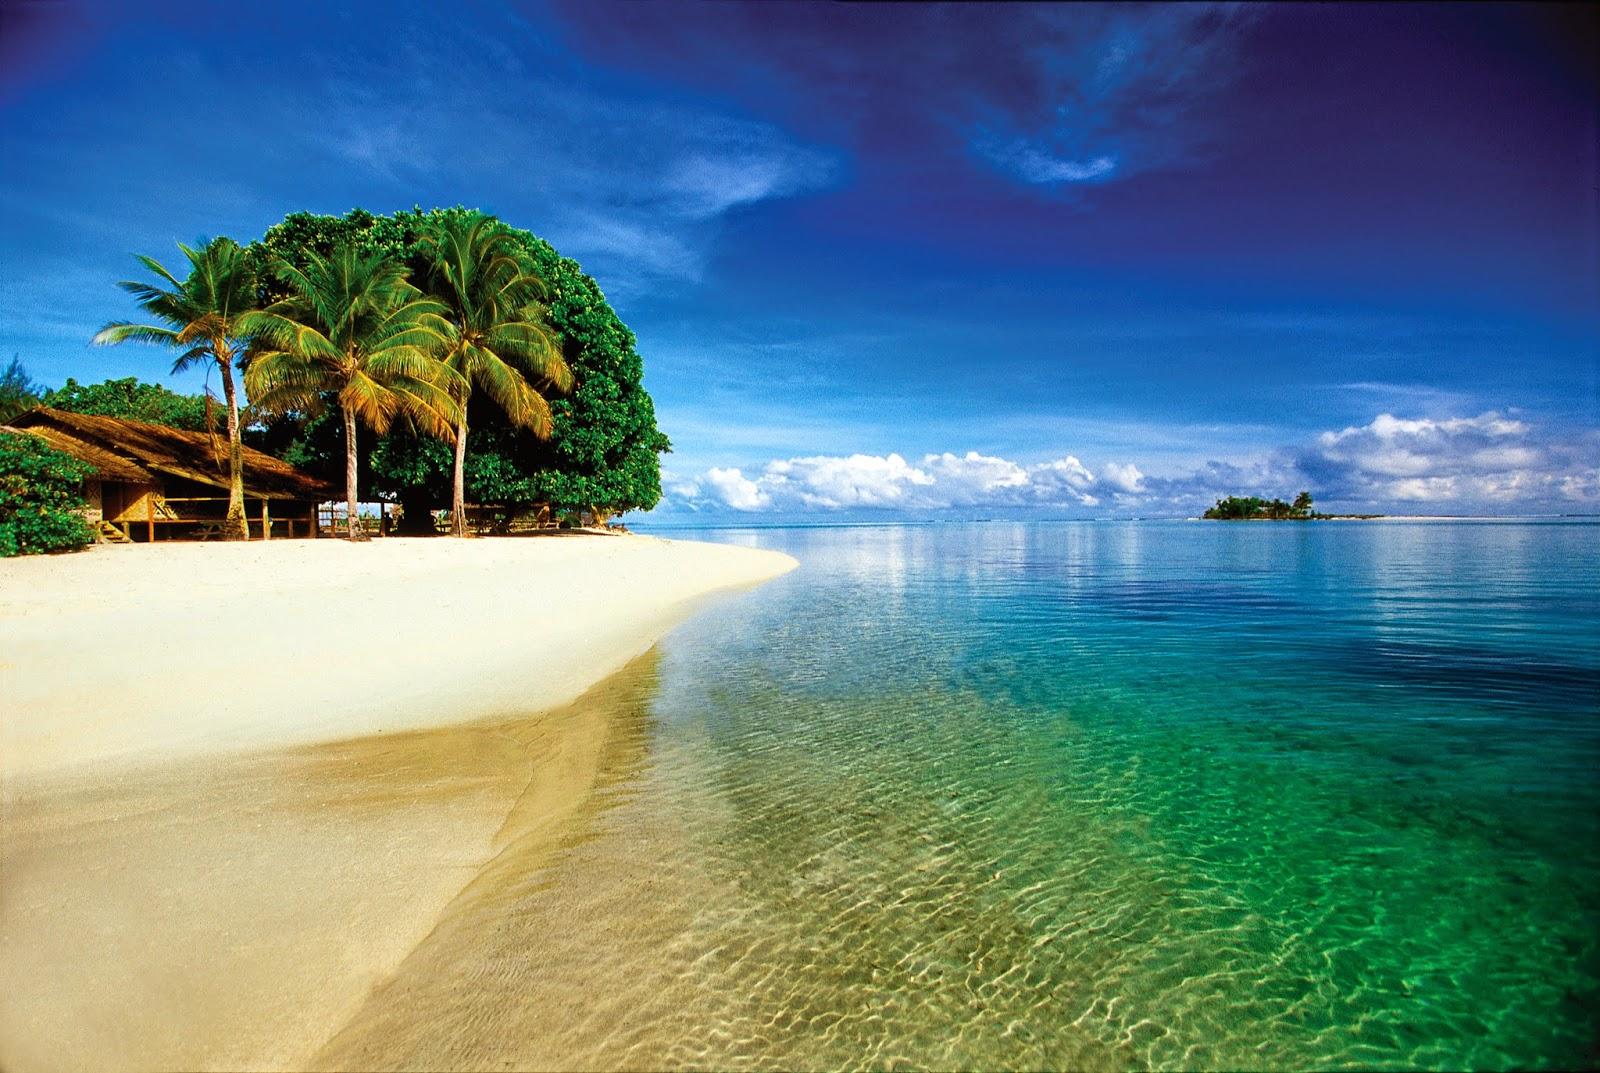 A REMOTE ISLAND NEAR NEW IRELAND - Papua New Guinea